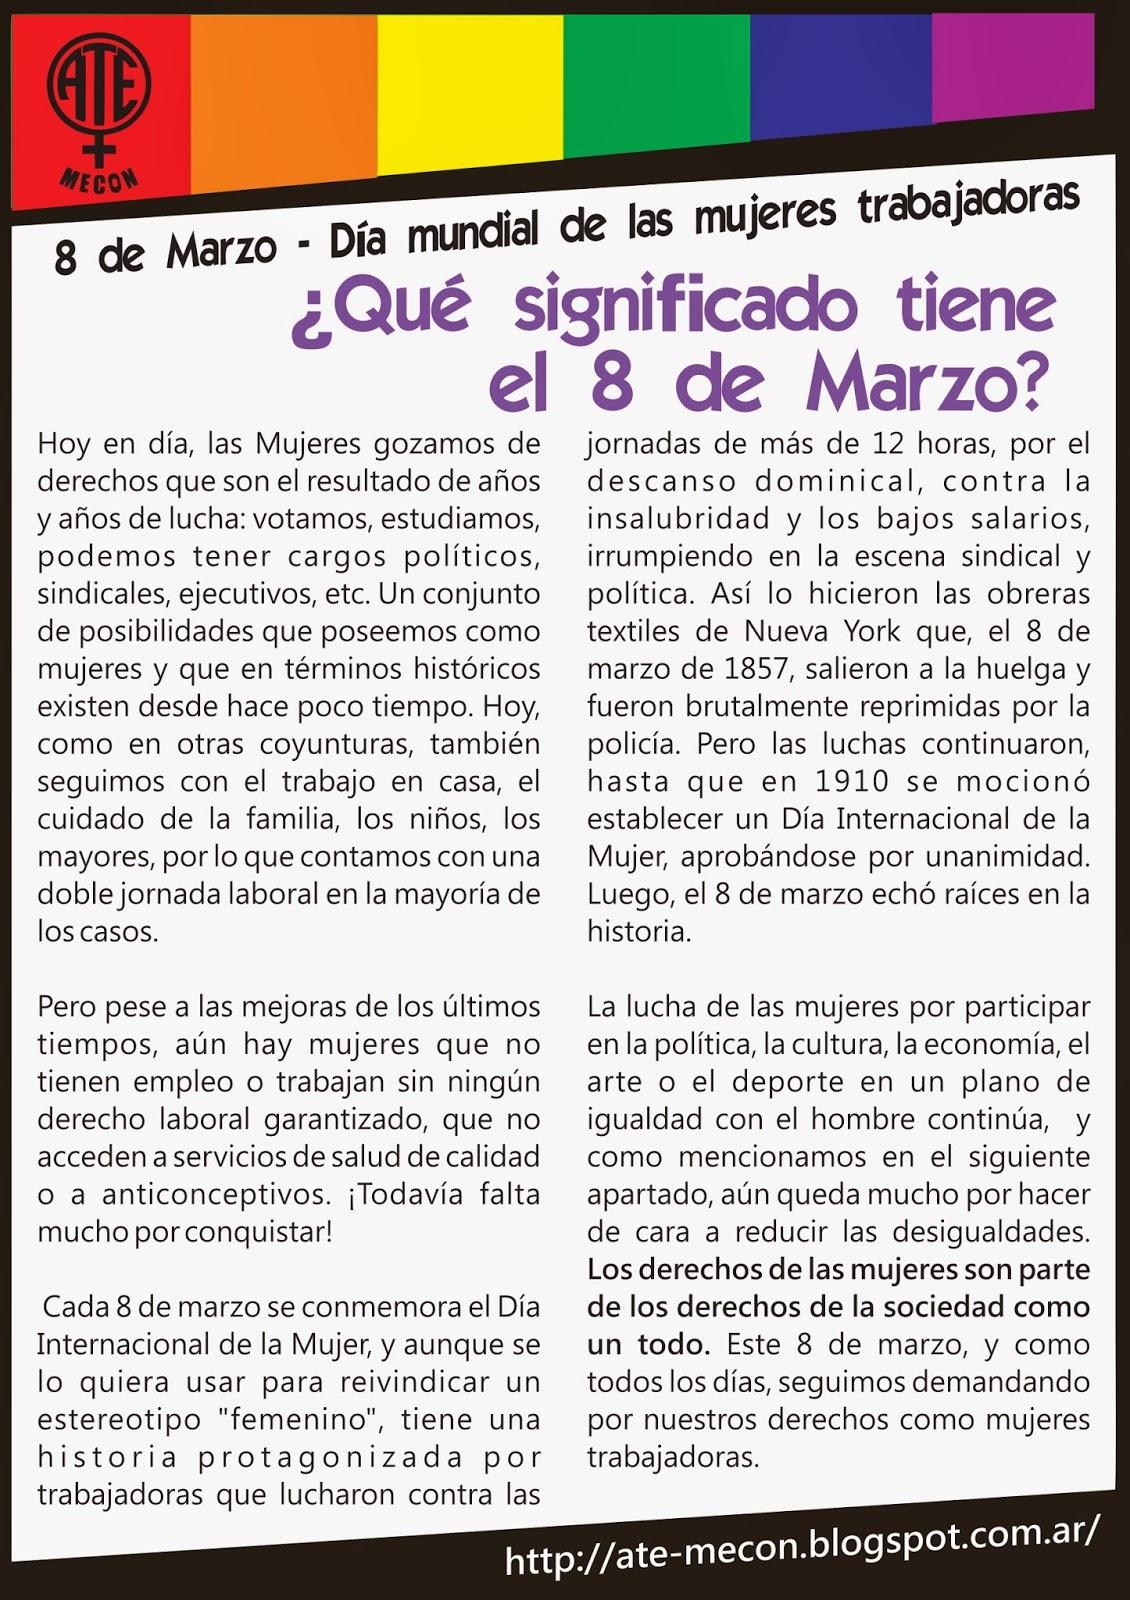 http://issuu.com/atemecon/docs/boletin_8_de_marzo_2014_ate_mecon_c